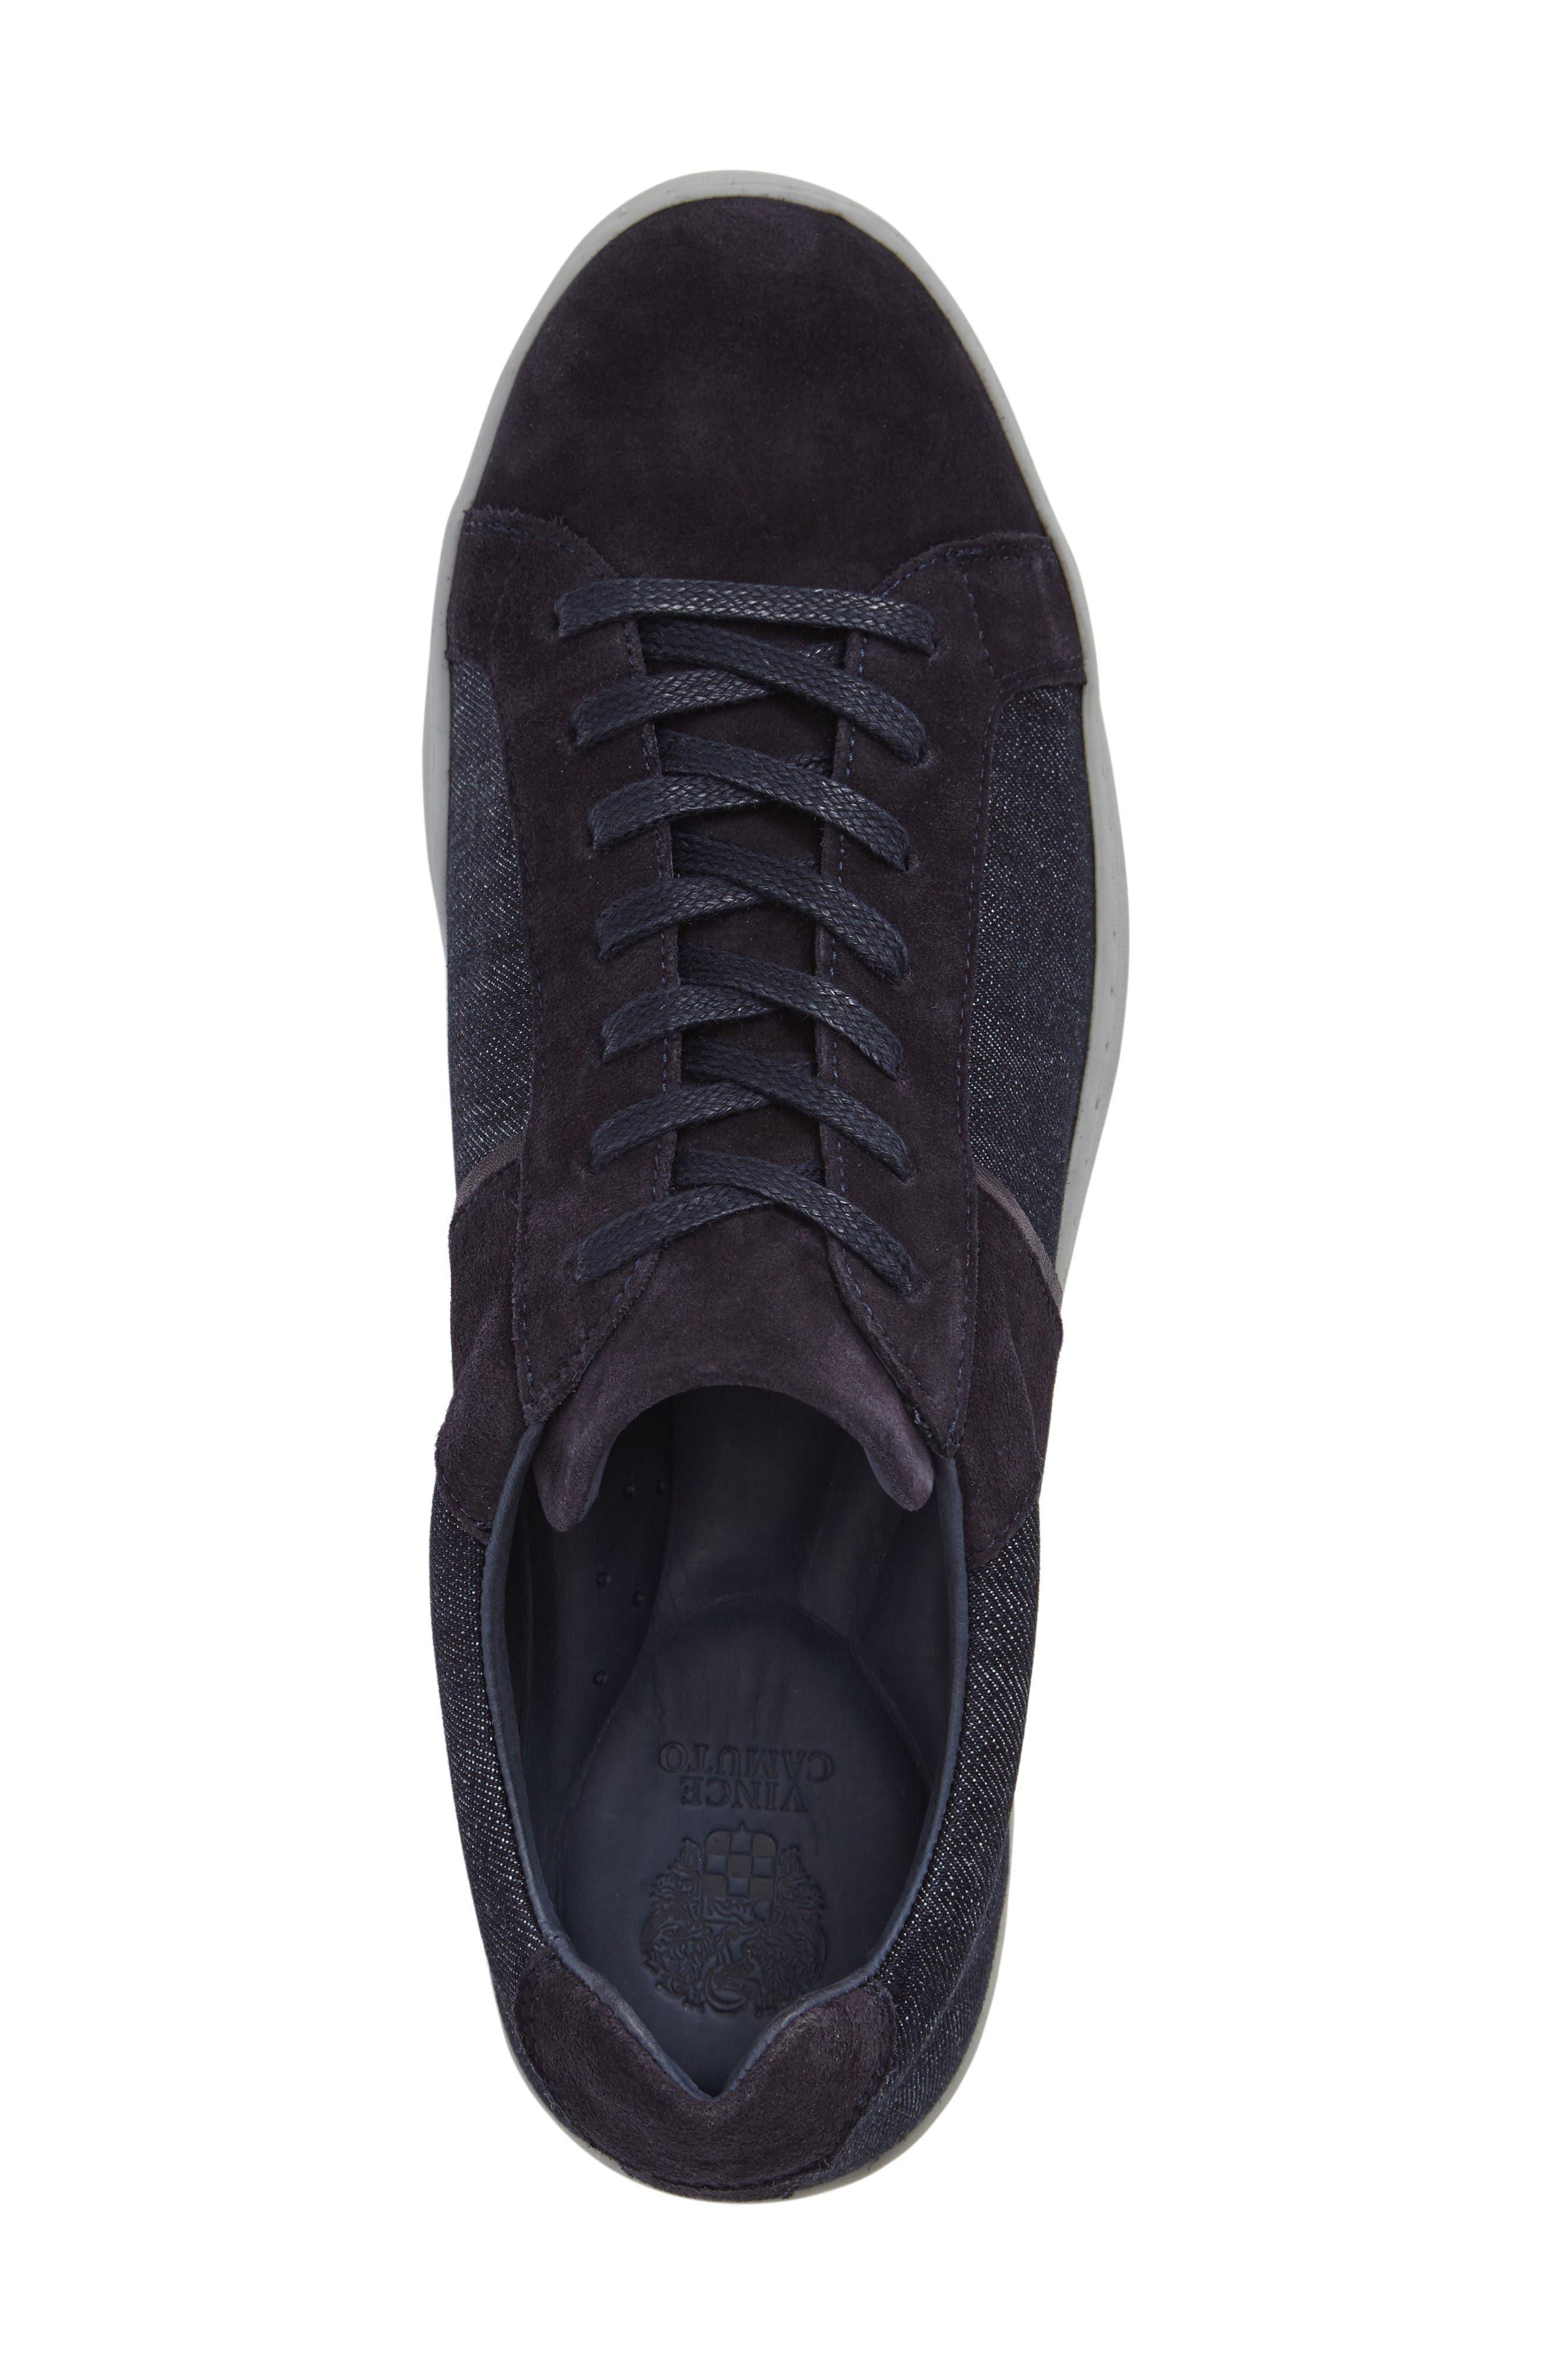 Ginx Sneaker,                             Alternate thumbnail 3, color,                             Marino Suede